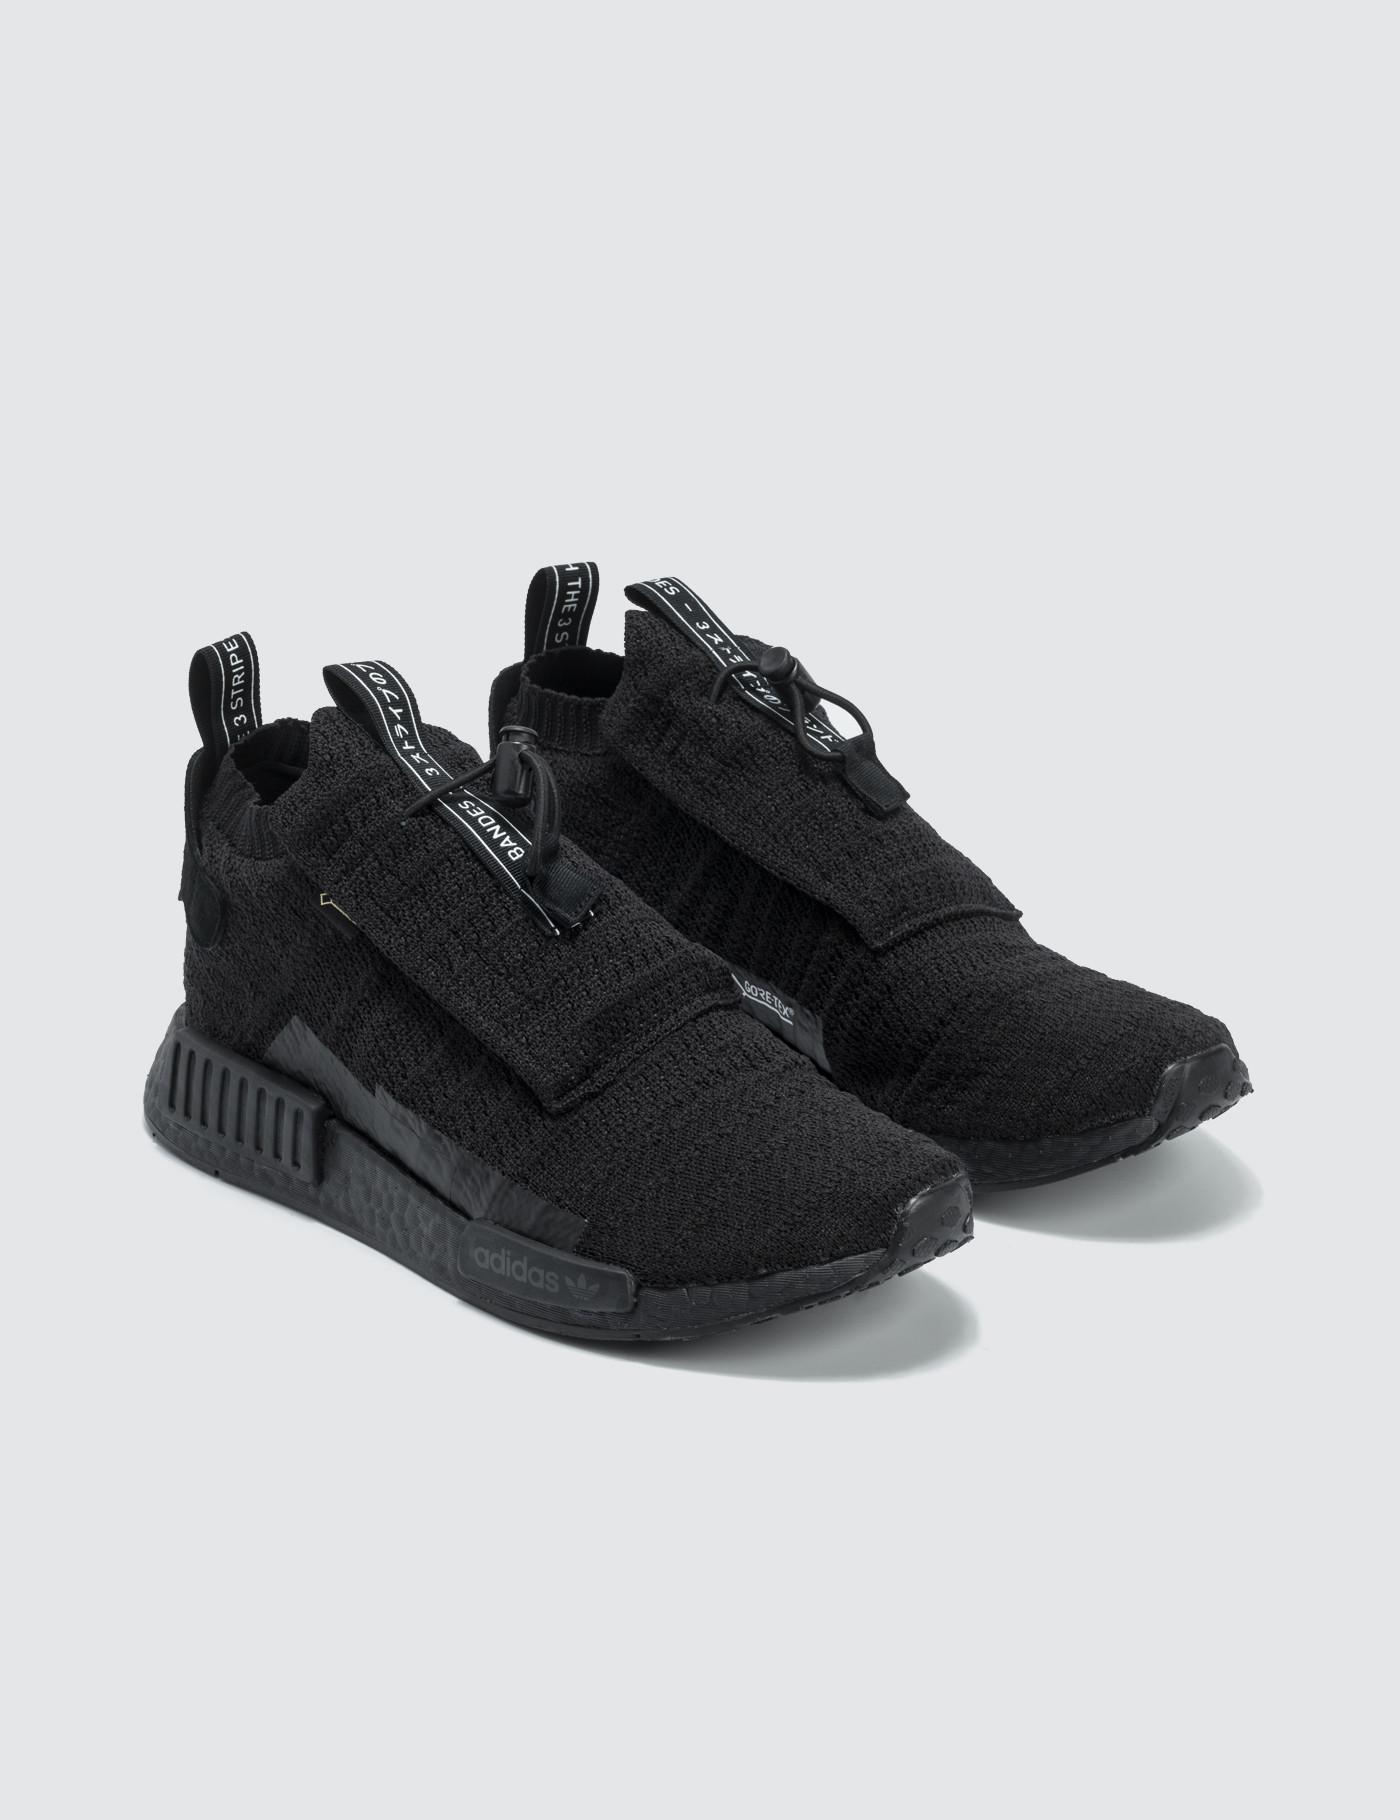 best service 7dd8e 13bf0 adidas Originals Nmd Ts1 Primeknit Gtx in Black for Men - Lyst